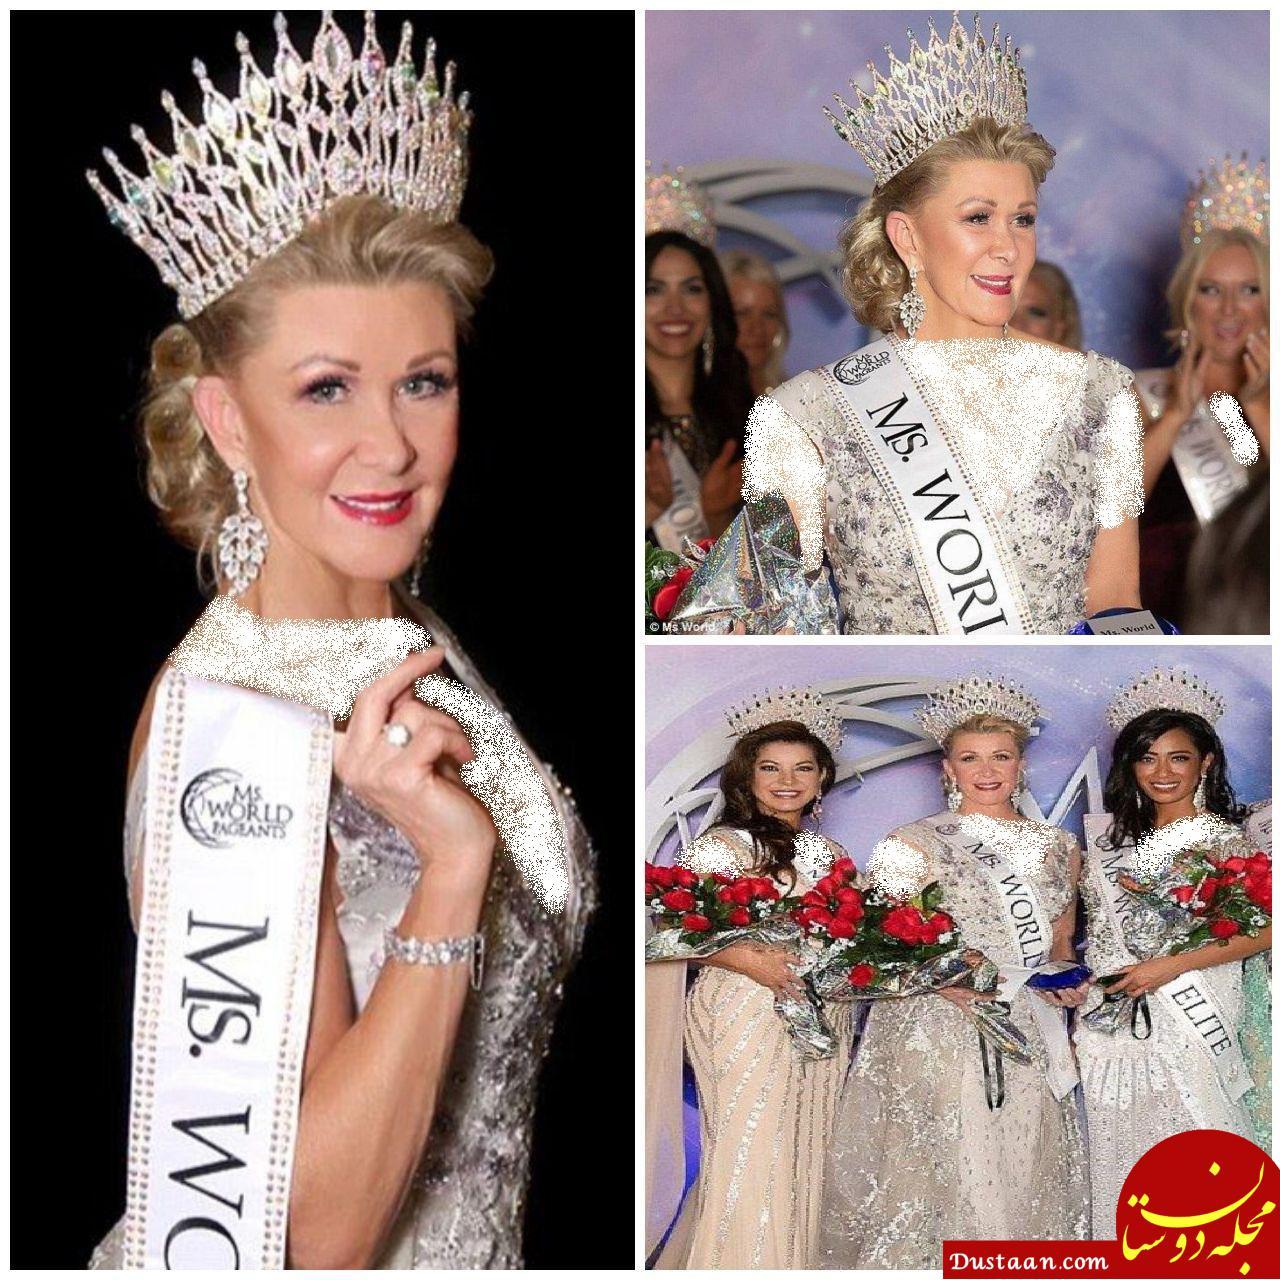 www.dustaan.com زن 60 ساله ای که ملکه زیبایی جهان شد! +تصاویر